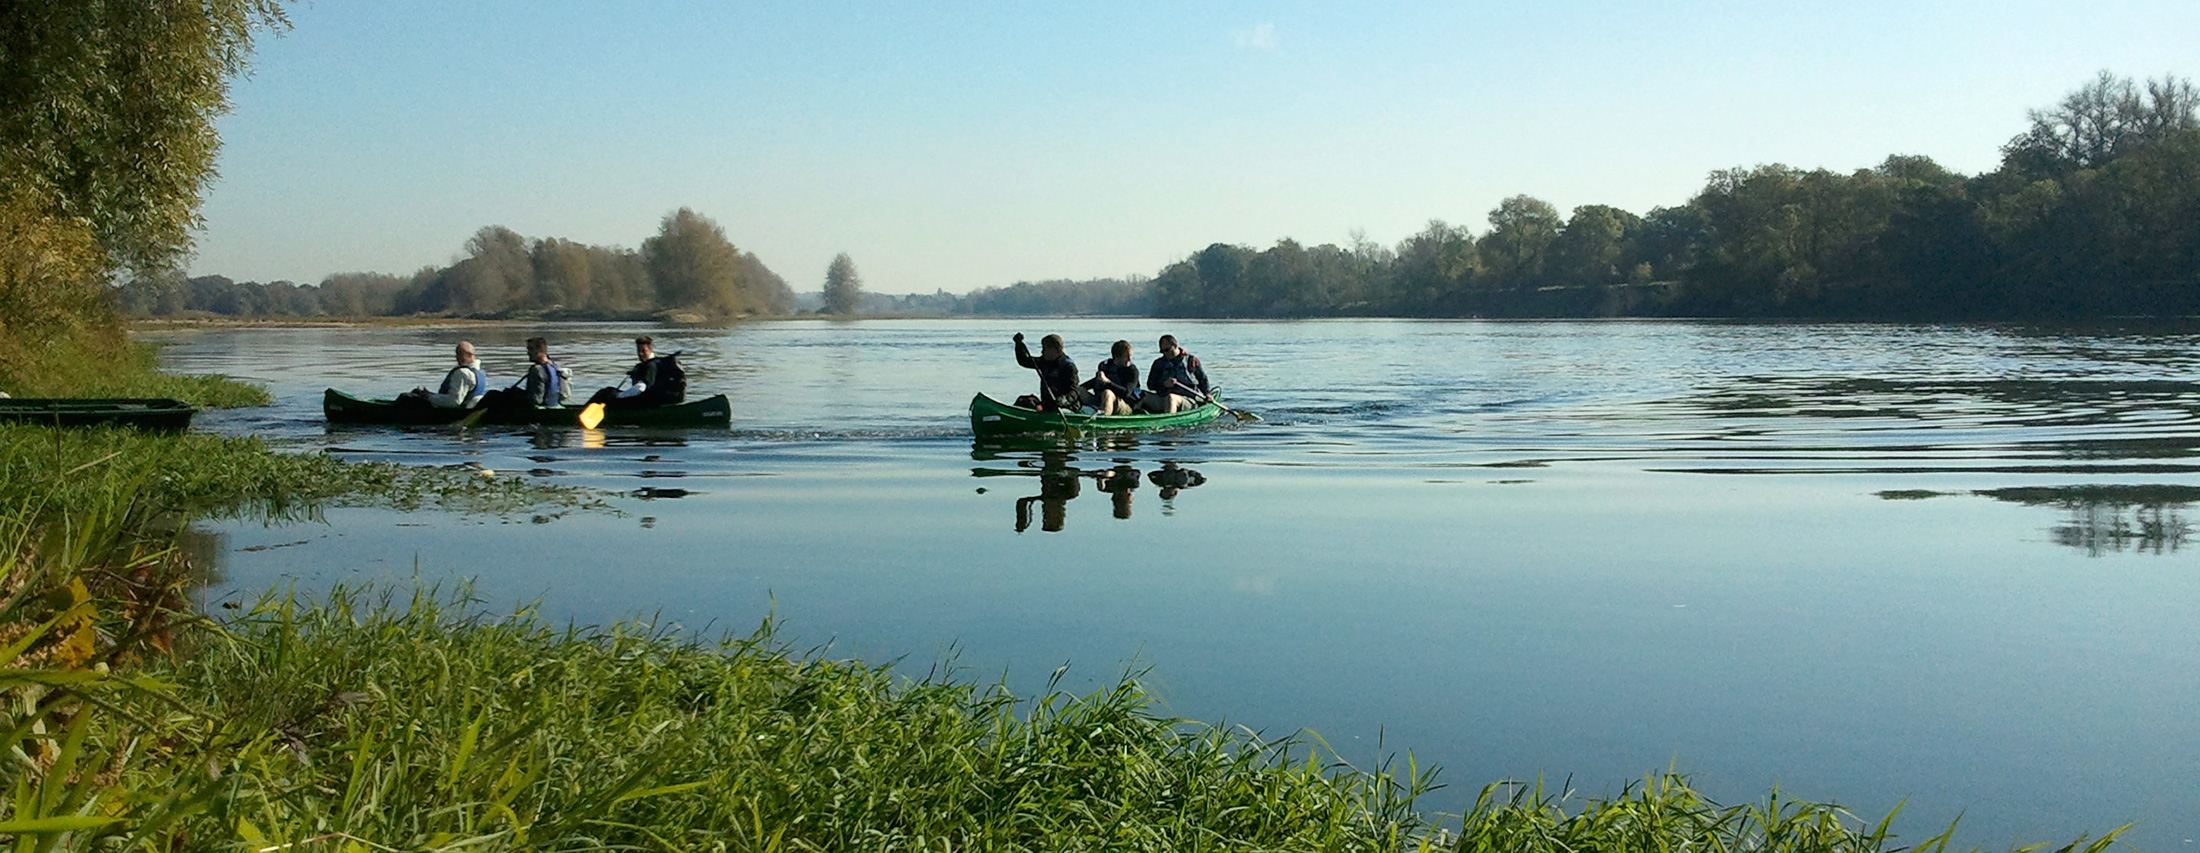 bande_canoe2.jpg